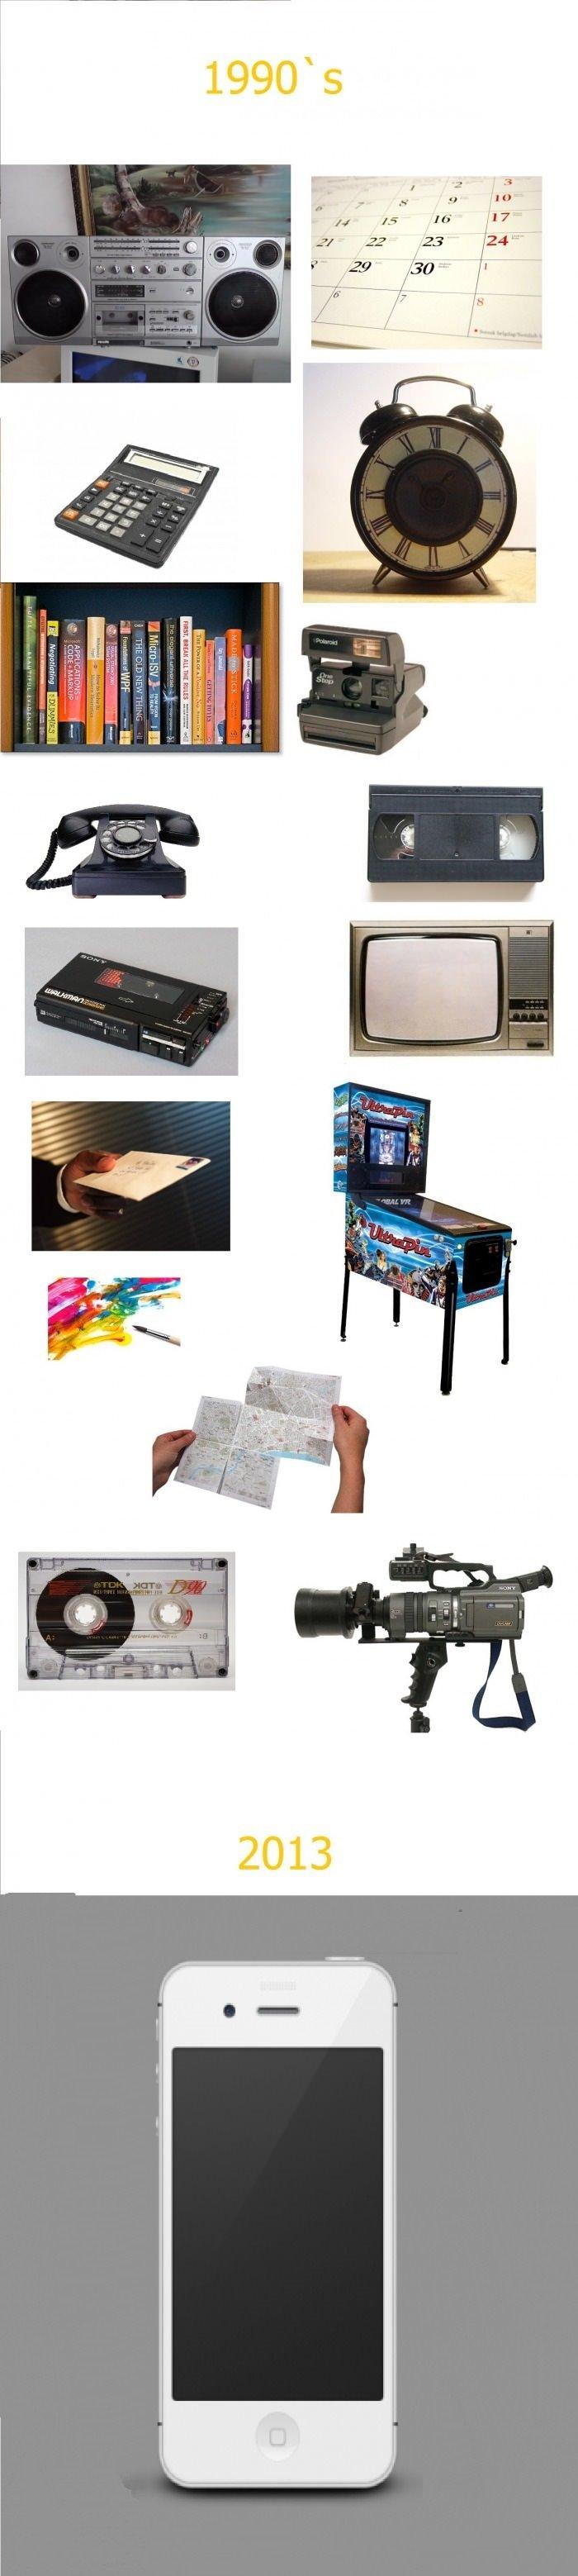 Evolution of technology. .. 2015 Evolution of technology 2015